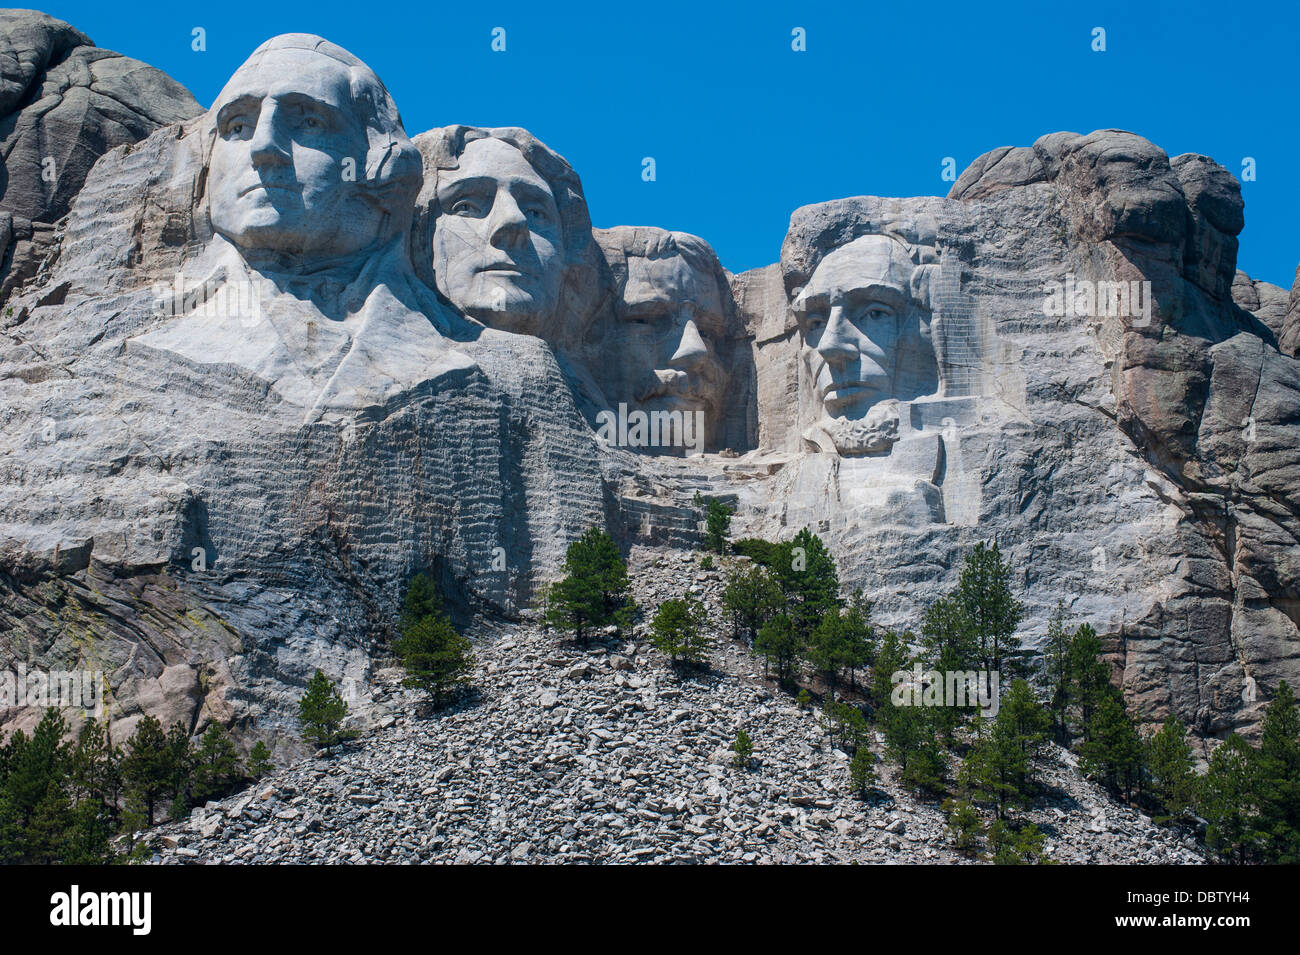 Mount Rushmore, South Dakota, United States of America, North America Stock Photo